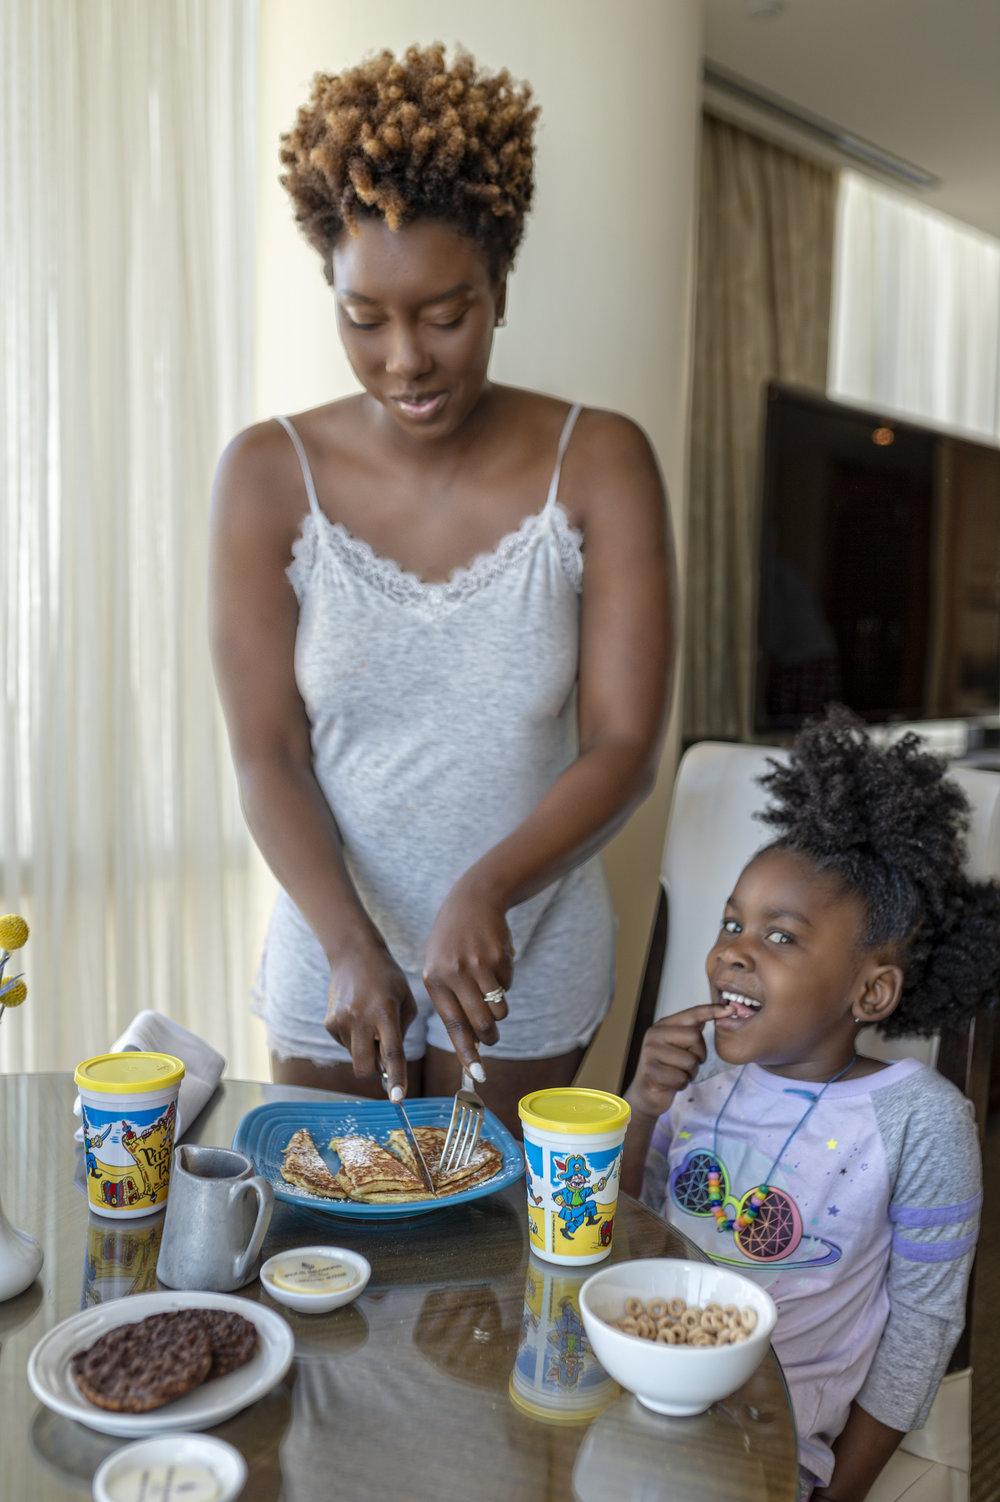 Four-Seasons-Baltimore-Family-Staycation-breakfast.jpg